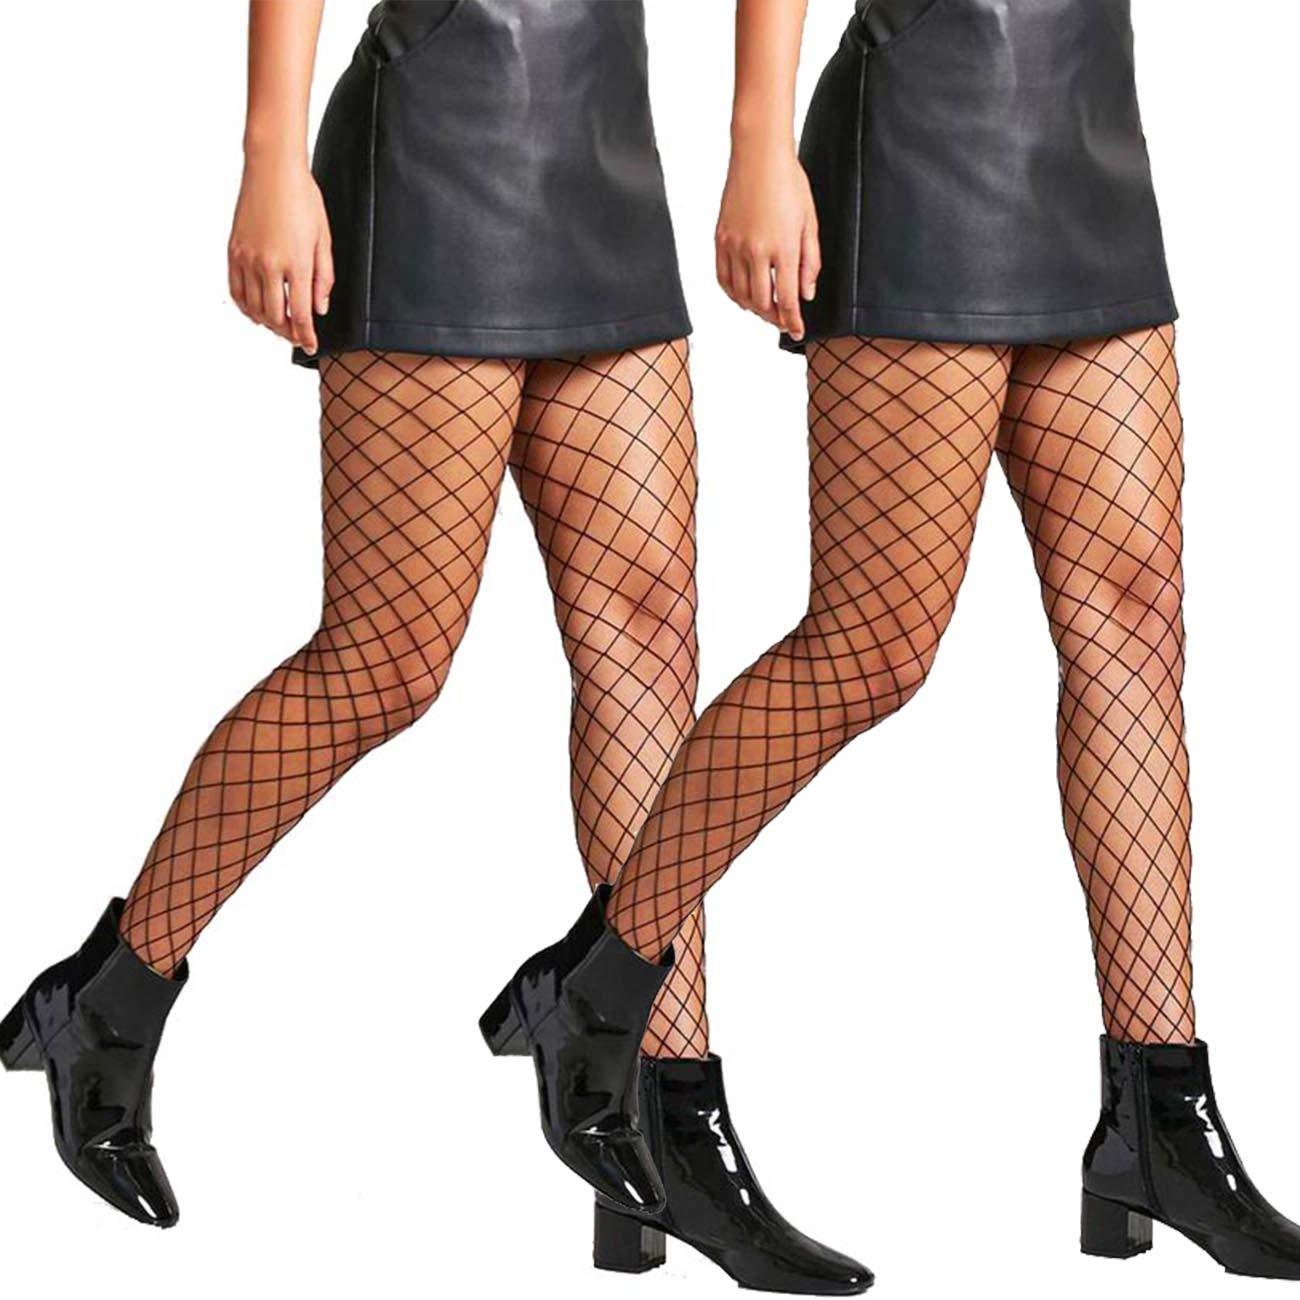 2 Pair Fishnet Stockings for Women High Waist Fish Net Tights Pantyhose DancMolly